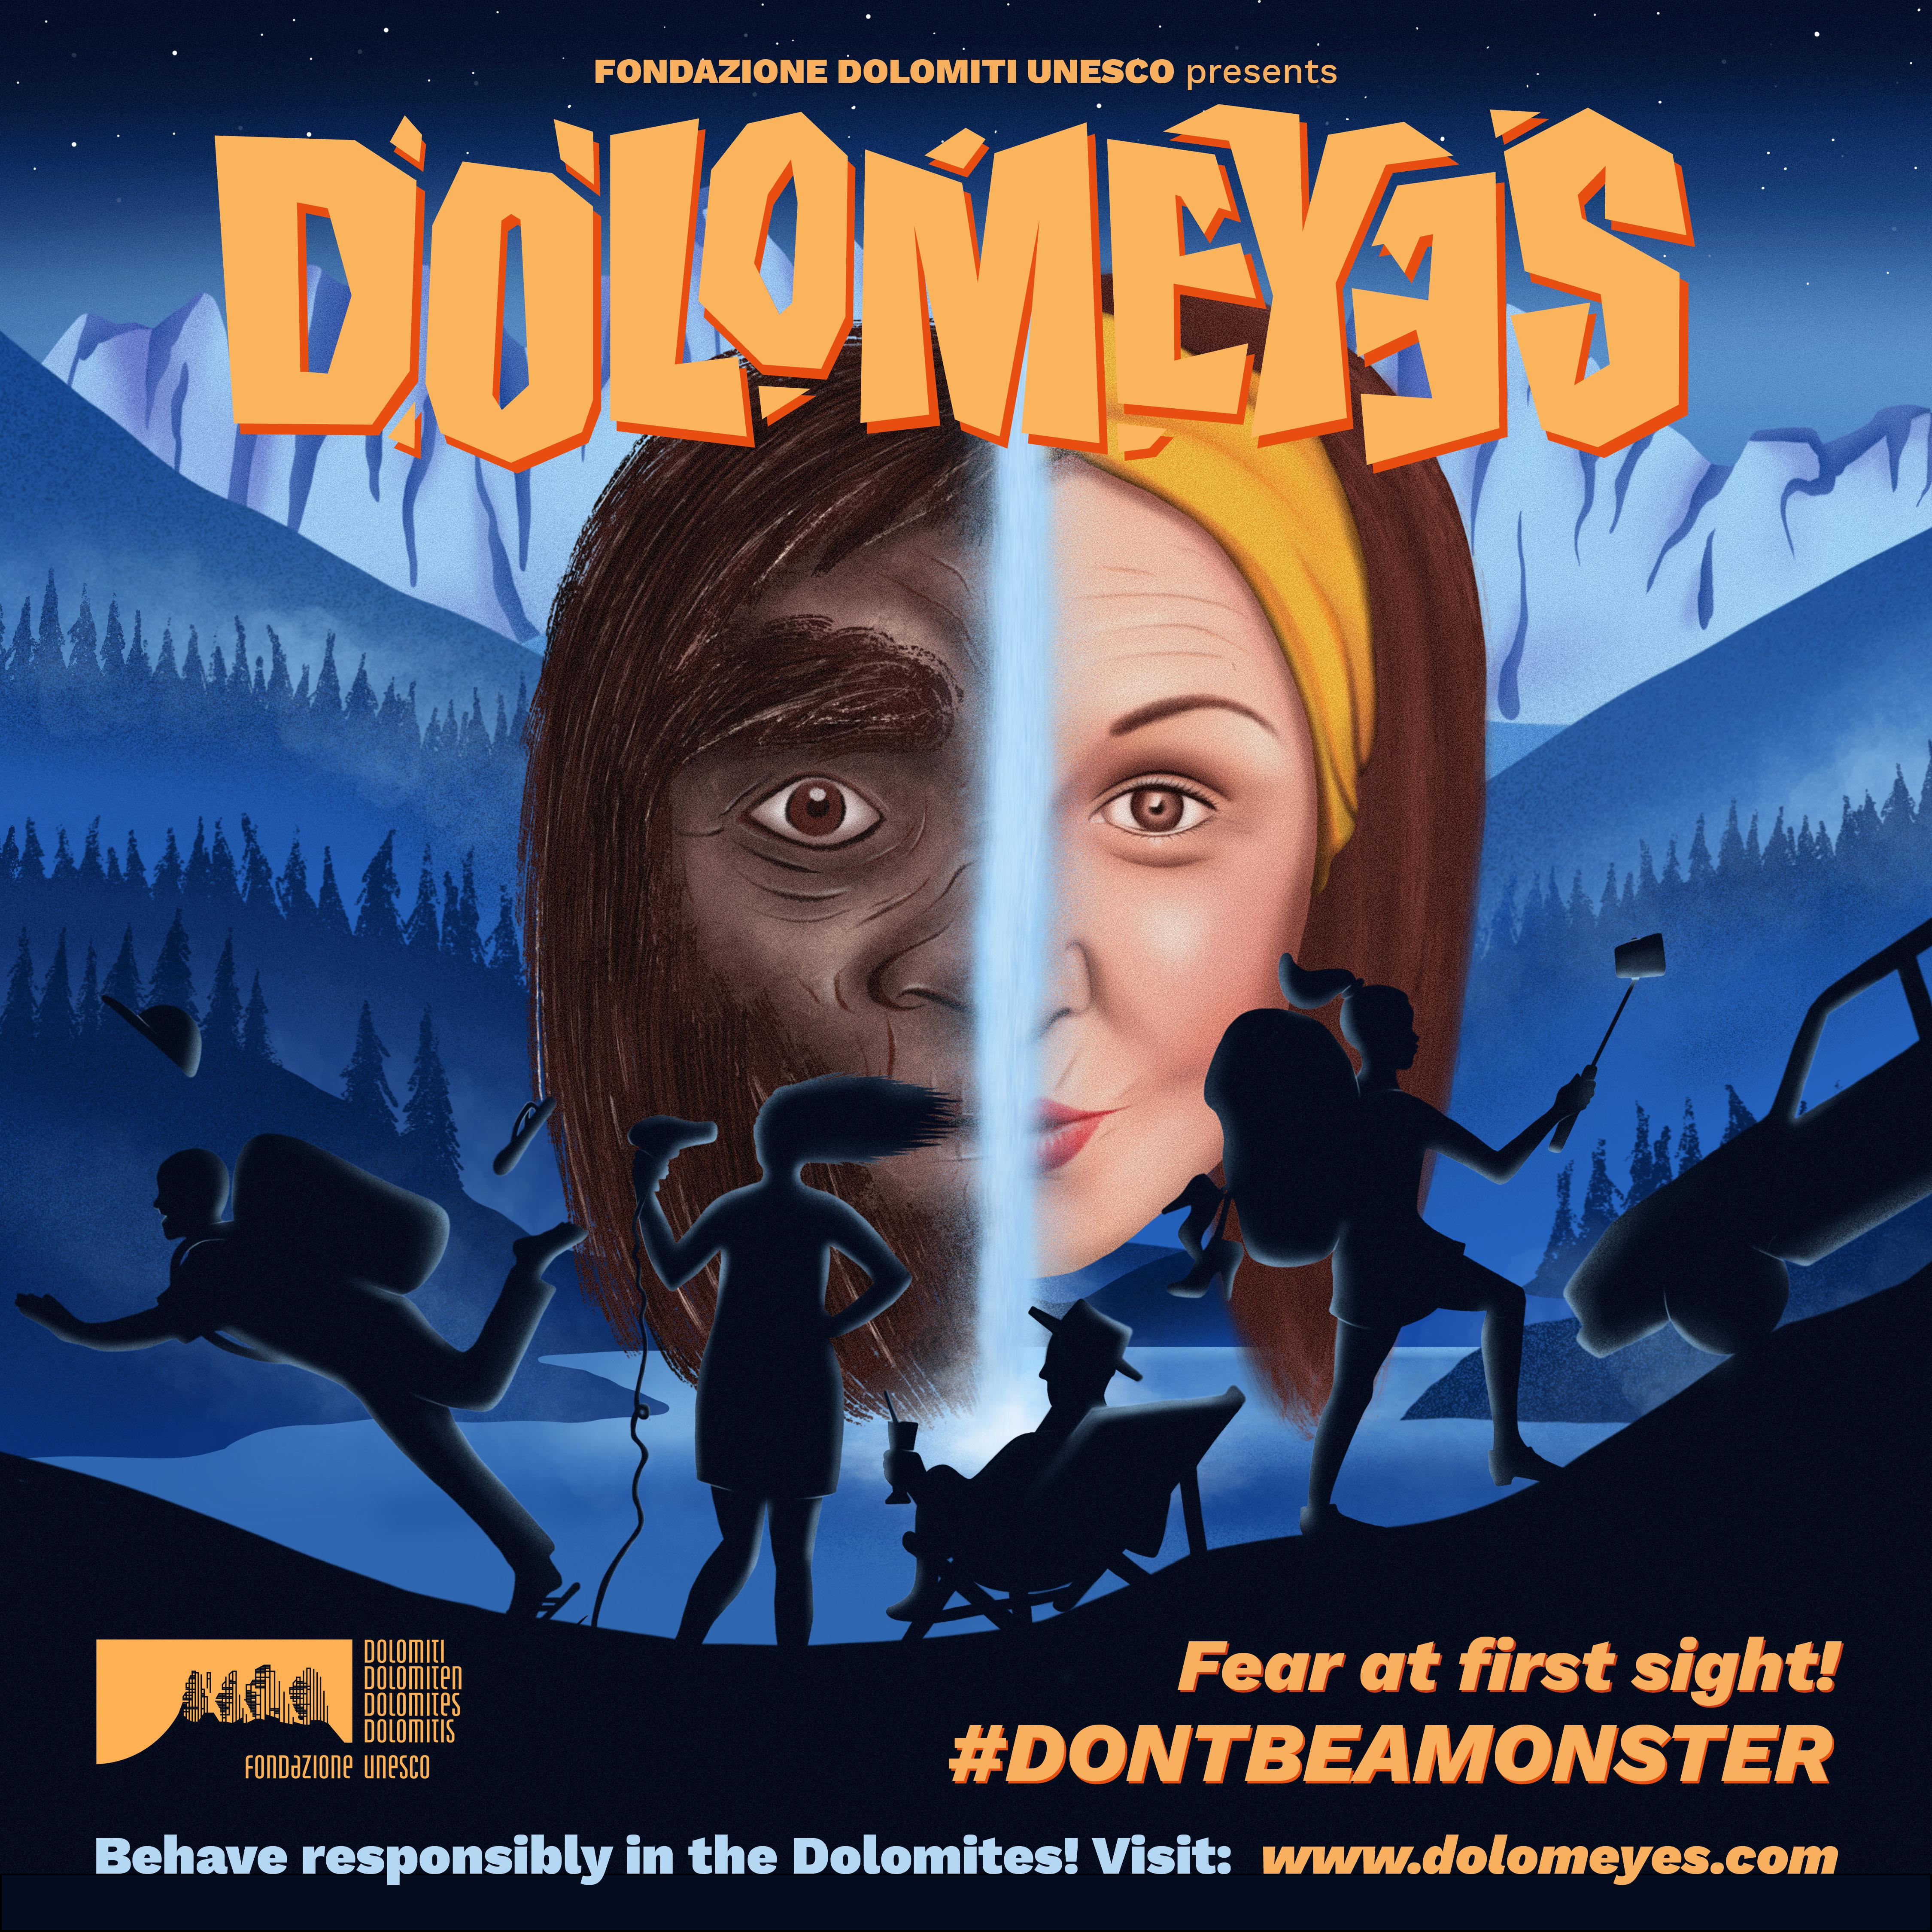 Campagna Dolomeyes